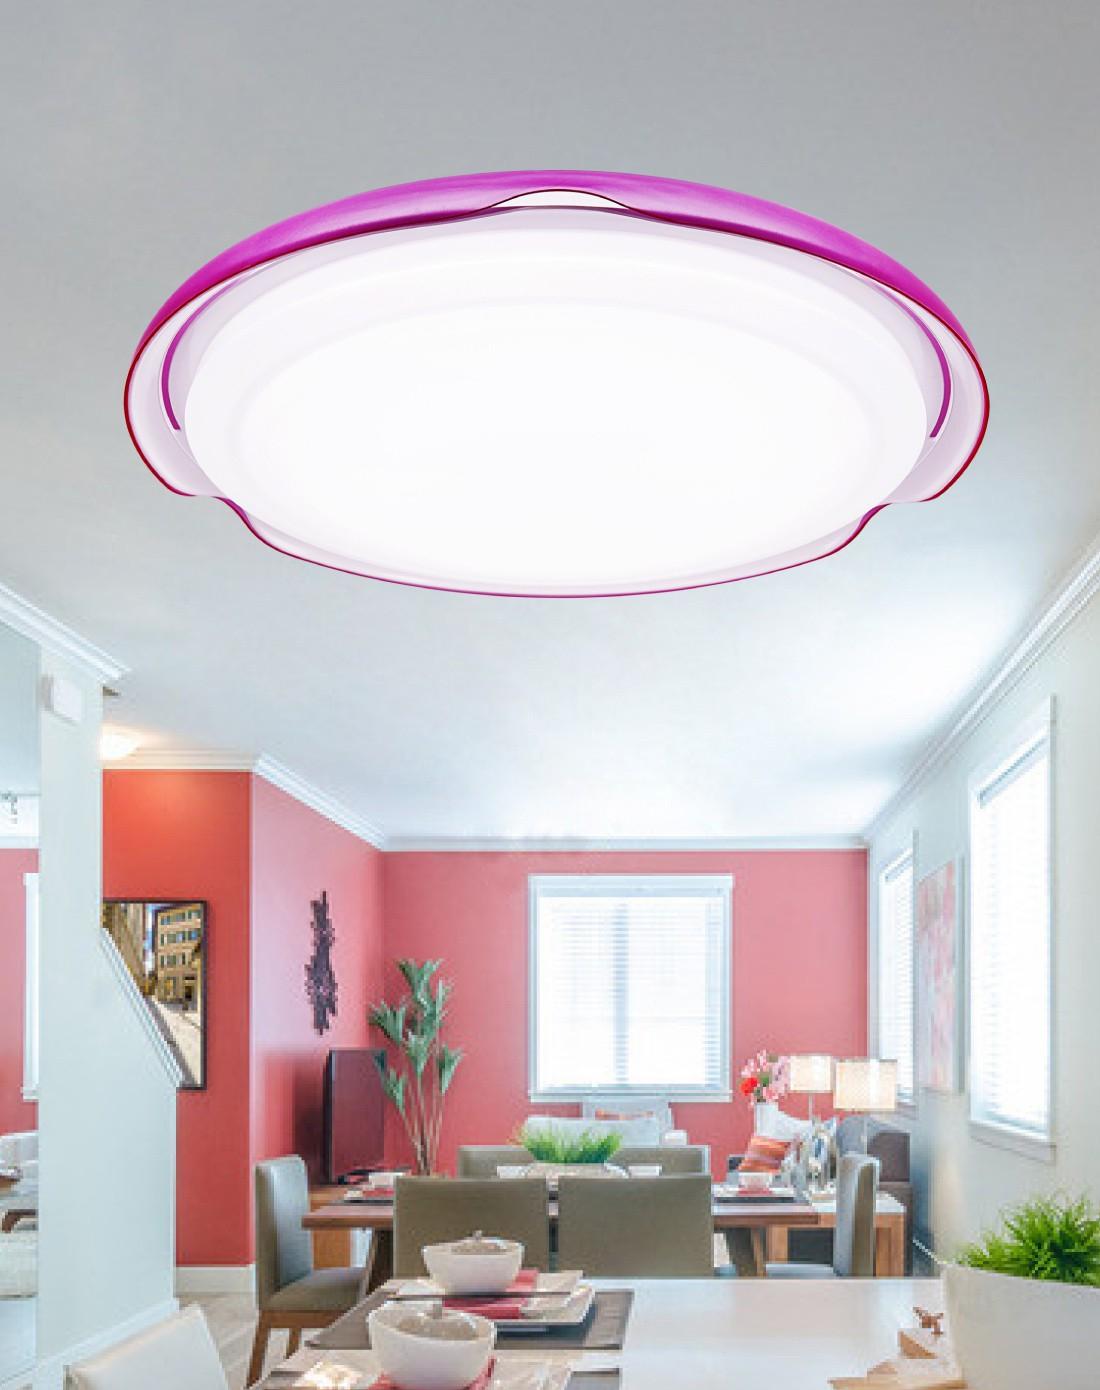 20w环航粉色圆形led家居吸顶灯